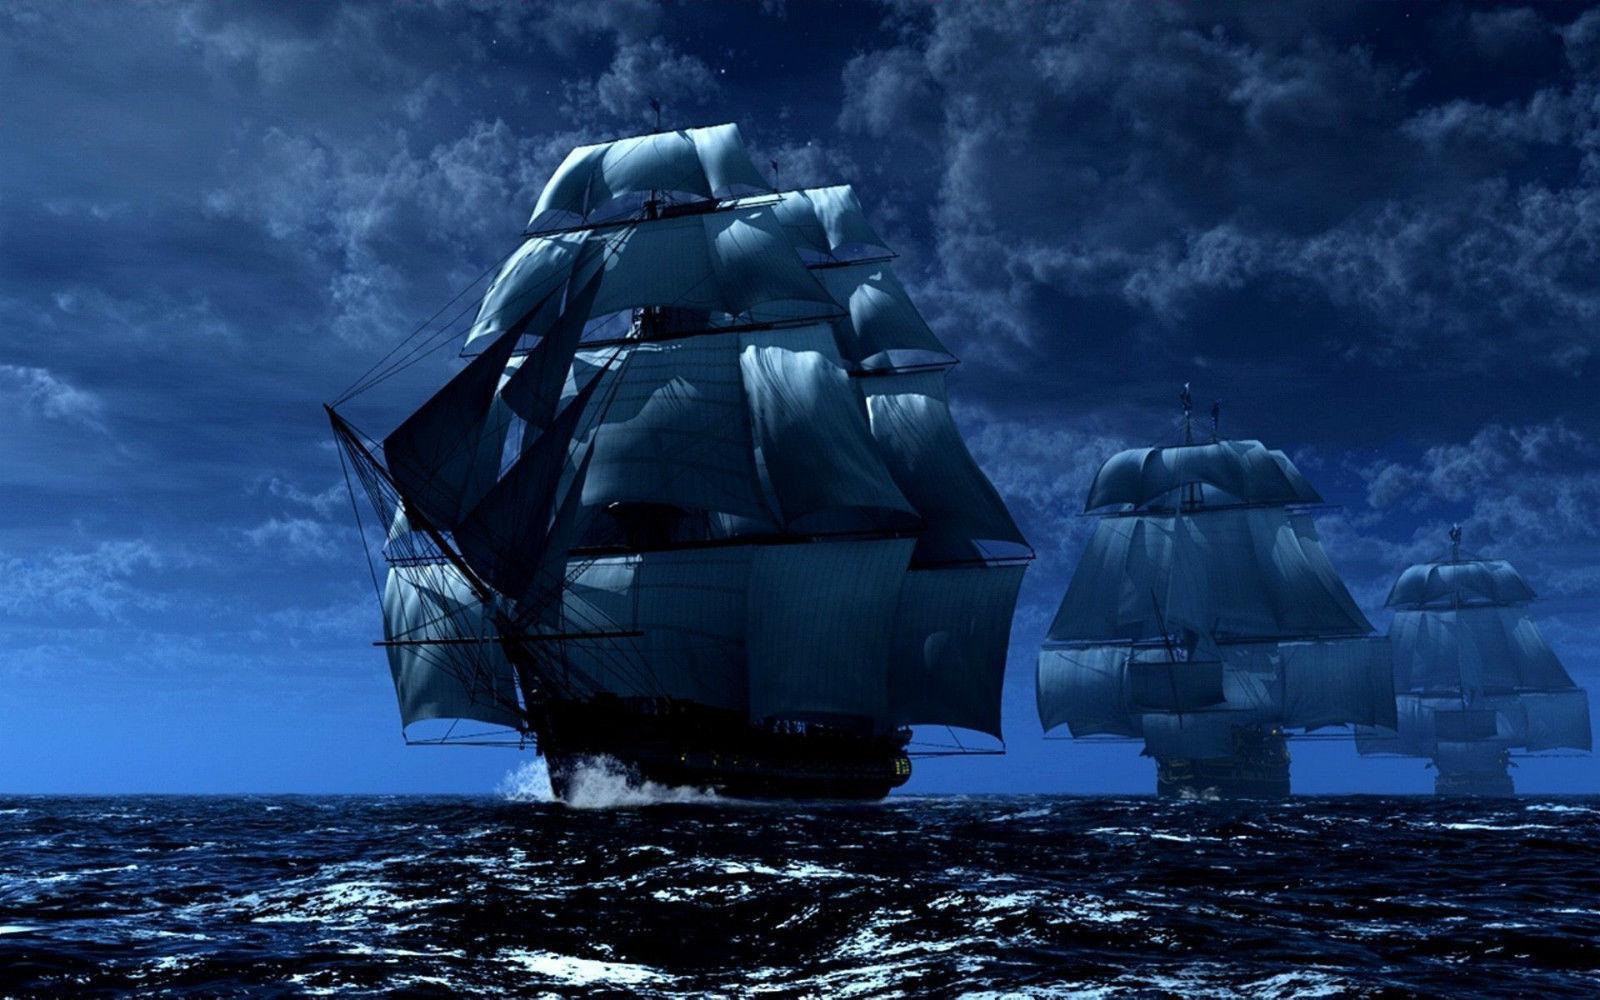 Pirate Ships Sailing the High Seas Art Silk Poster 24x36inch 24x43inch